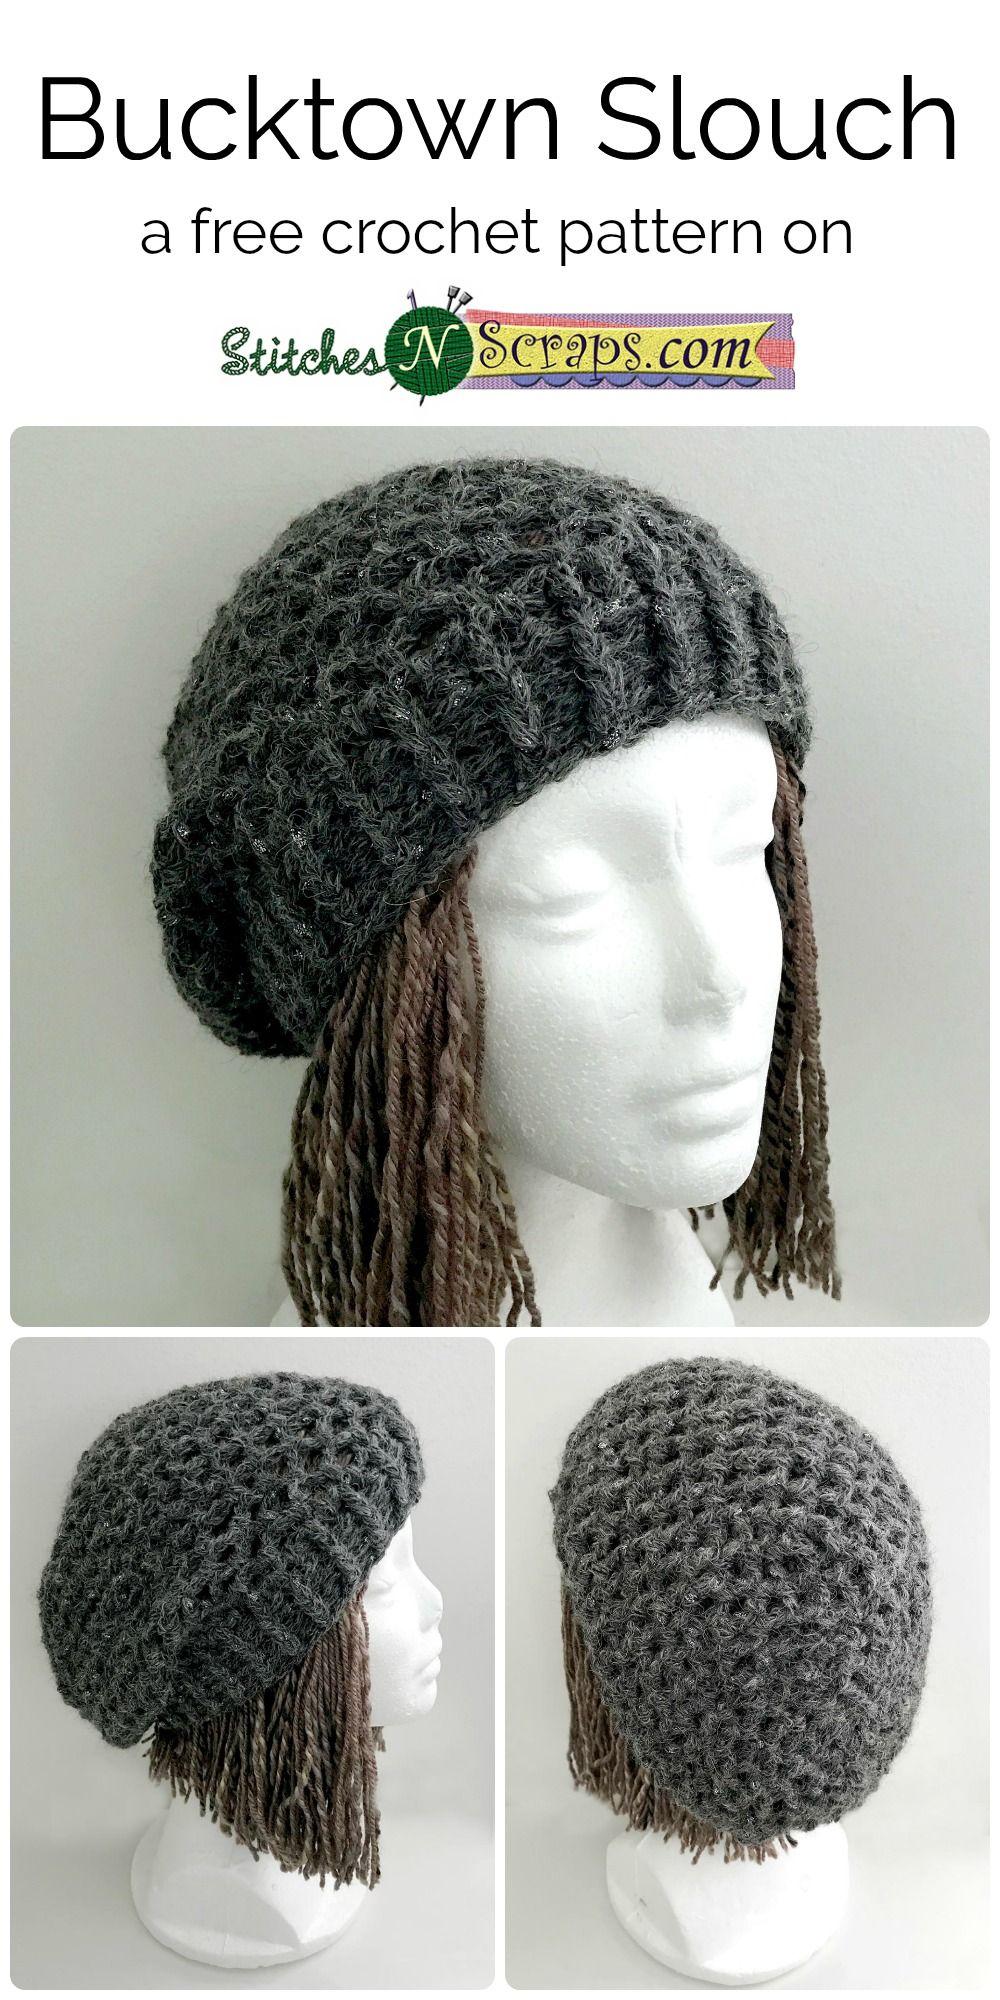 Bucktown Slouch - a free crochet pattern on StitchesNScraps.com ...